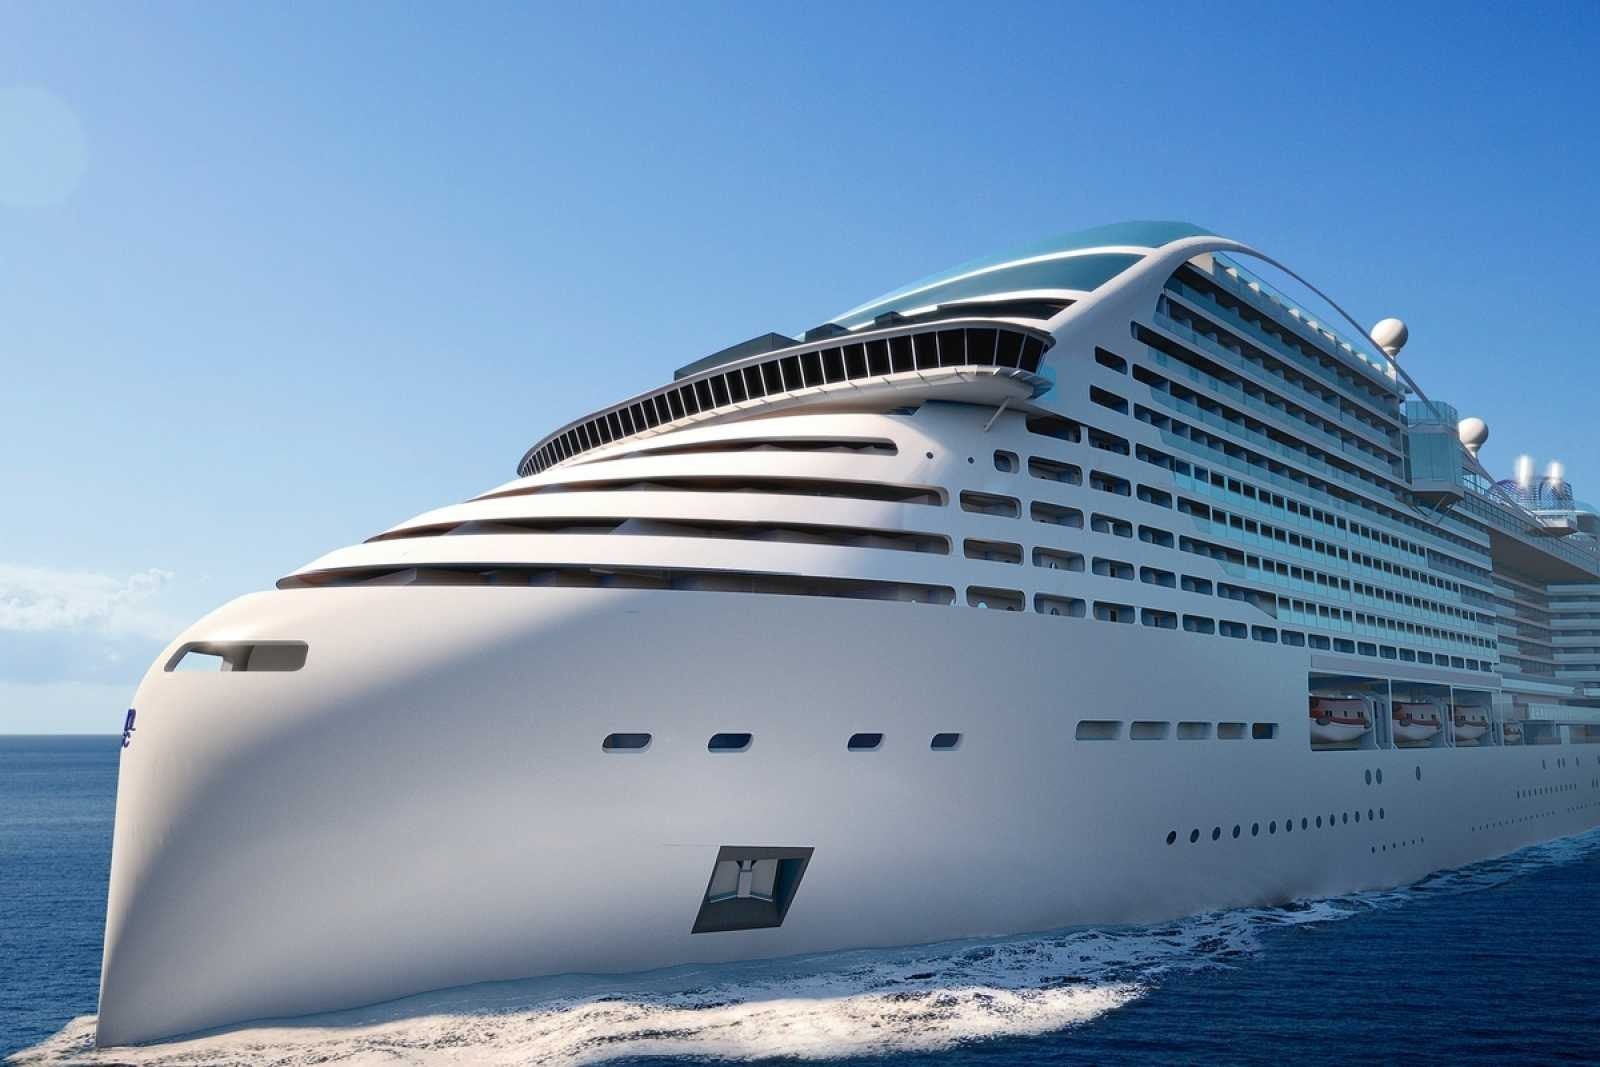 Wartsila cruise